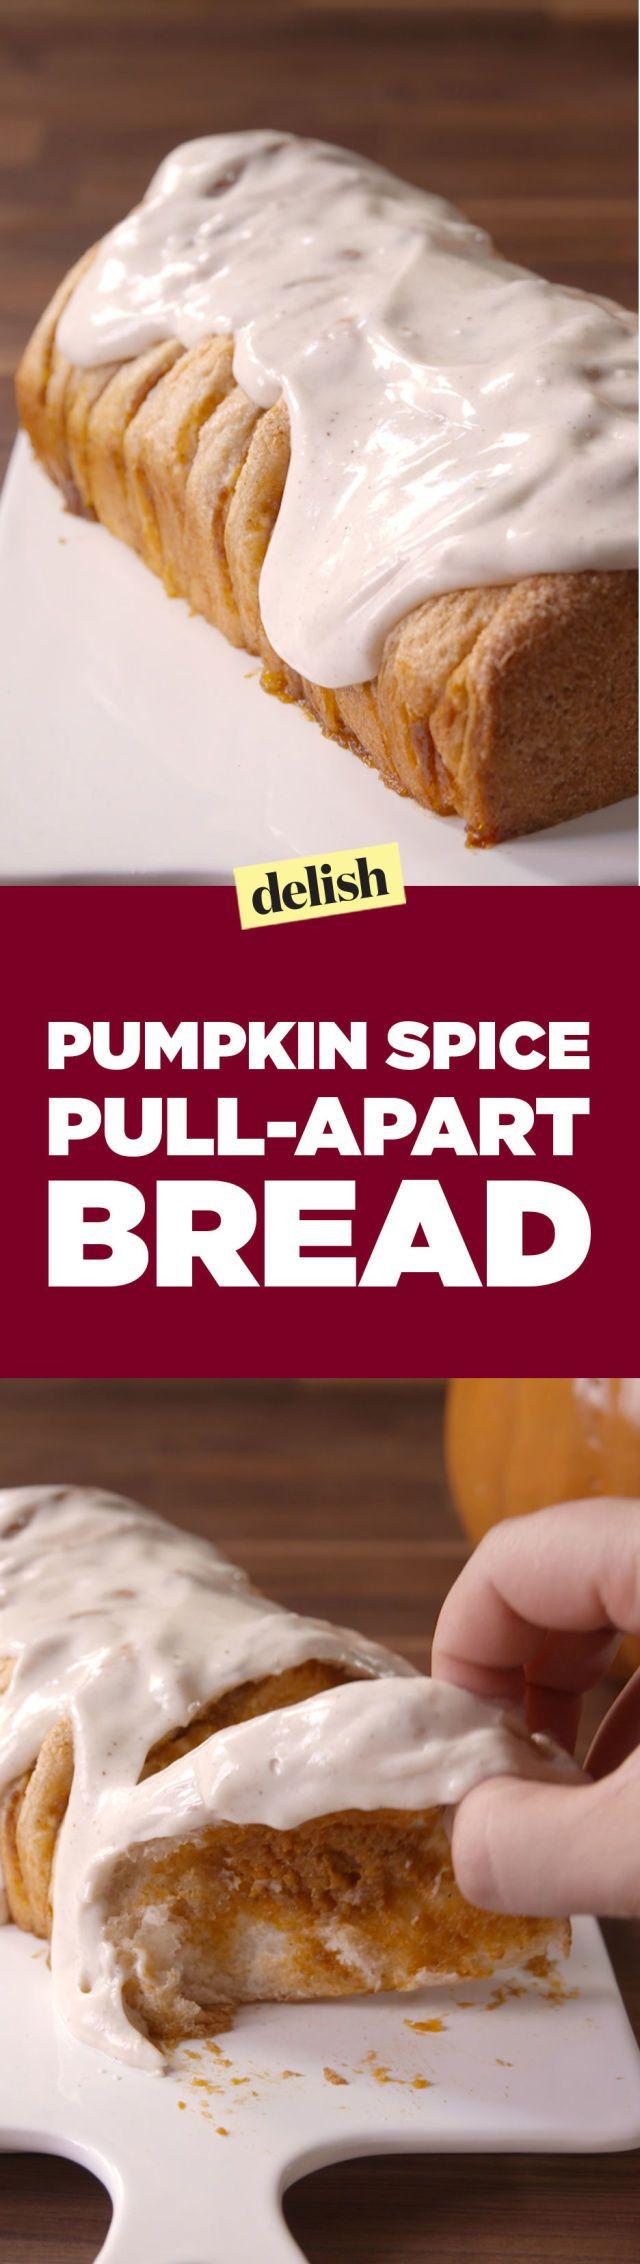 http://www.delish.com/cooking/recipe-ideas/recipes/a49734/pumpkin-spice-pull-apart-bread-recipe/